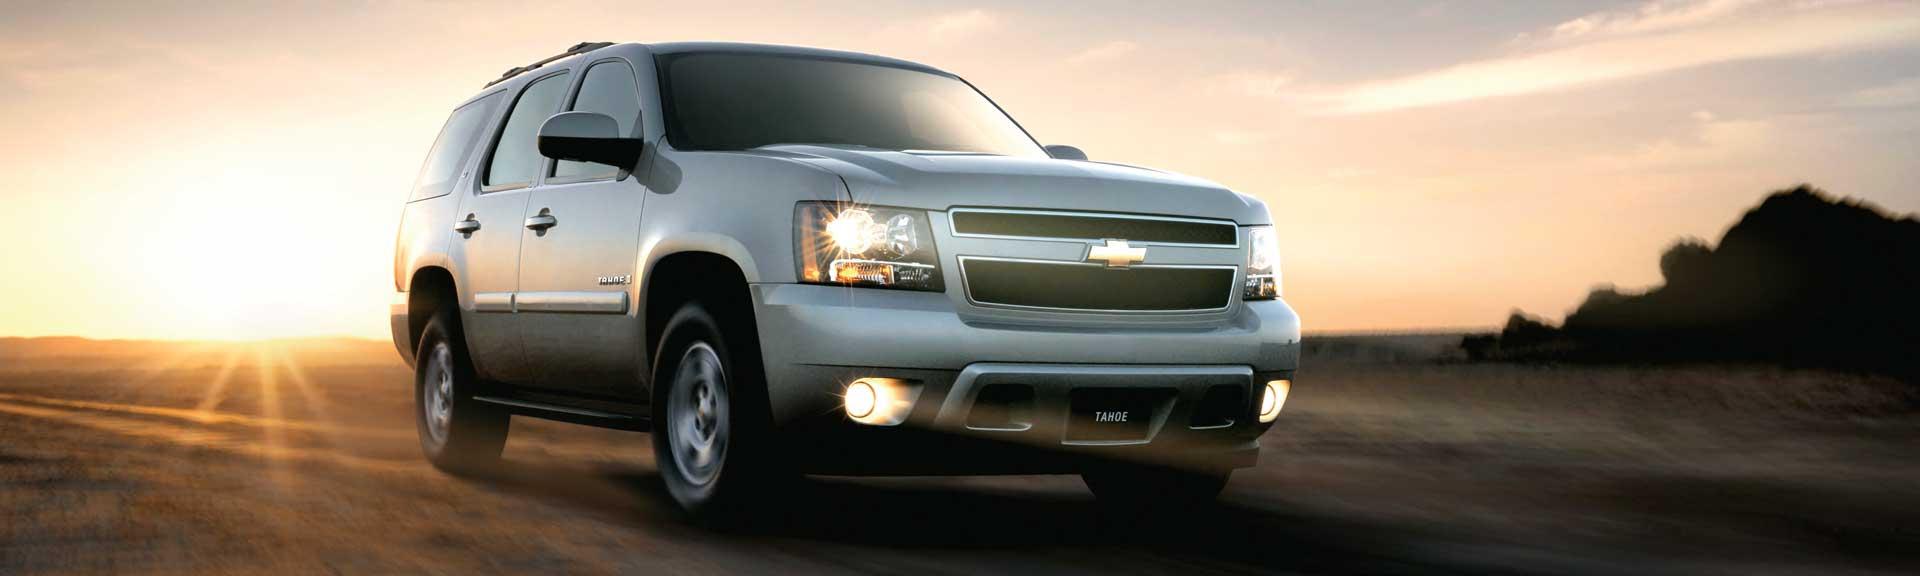 Buy Here Pay Here Greensboro Nc >> Best Auto Dealer Inc Car Dealer In Greensboro Nc